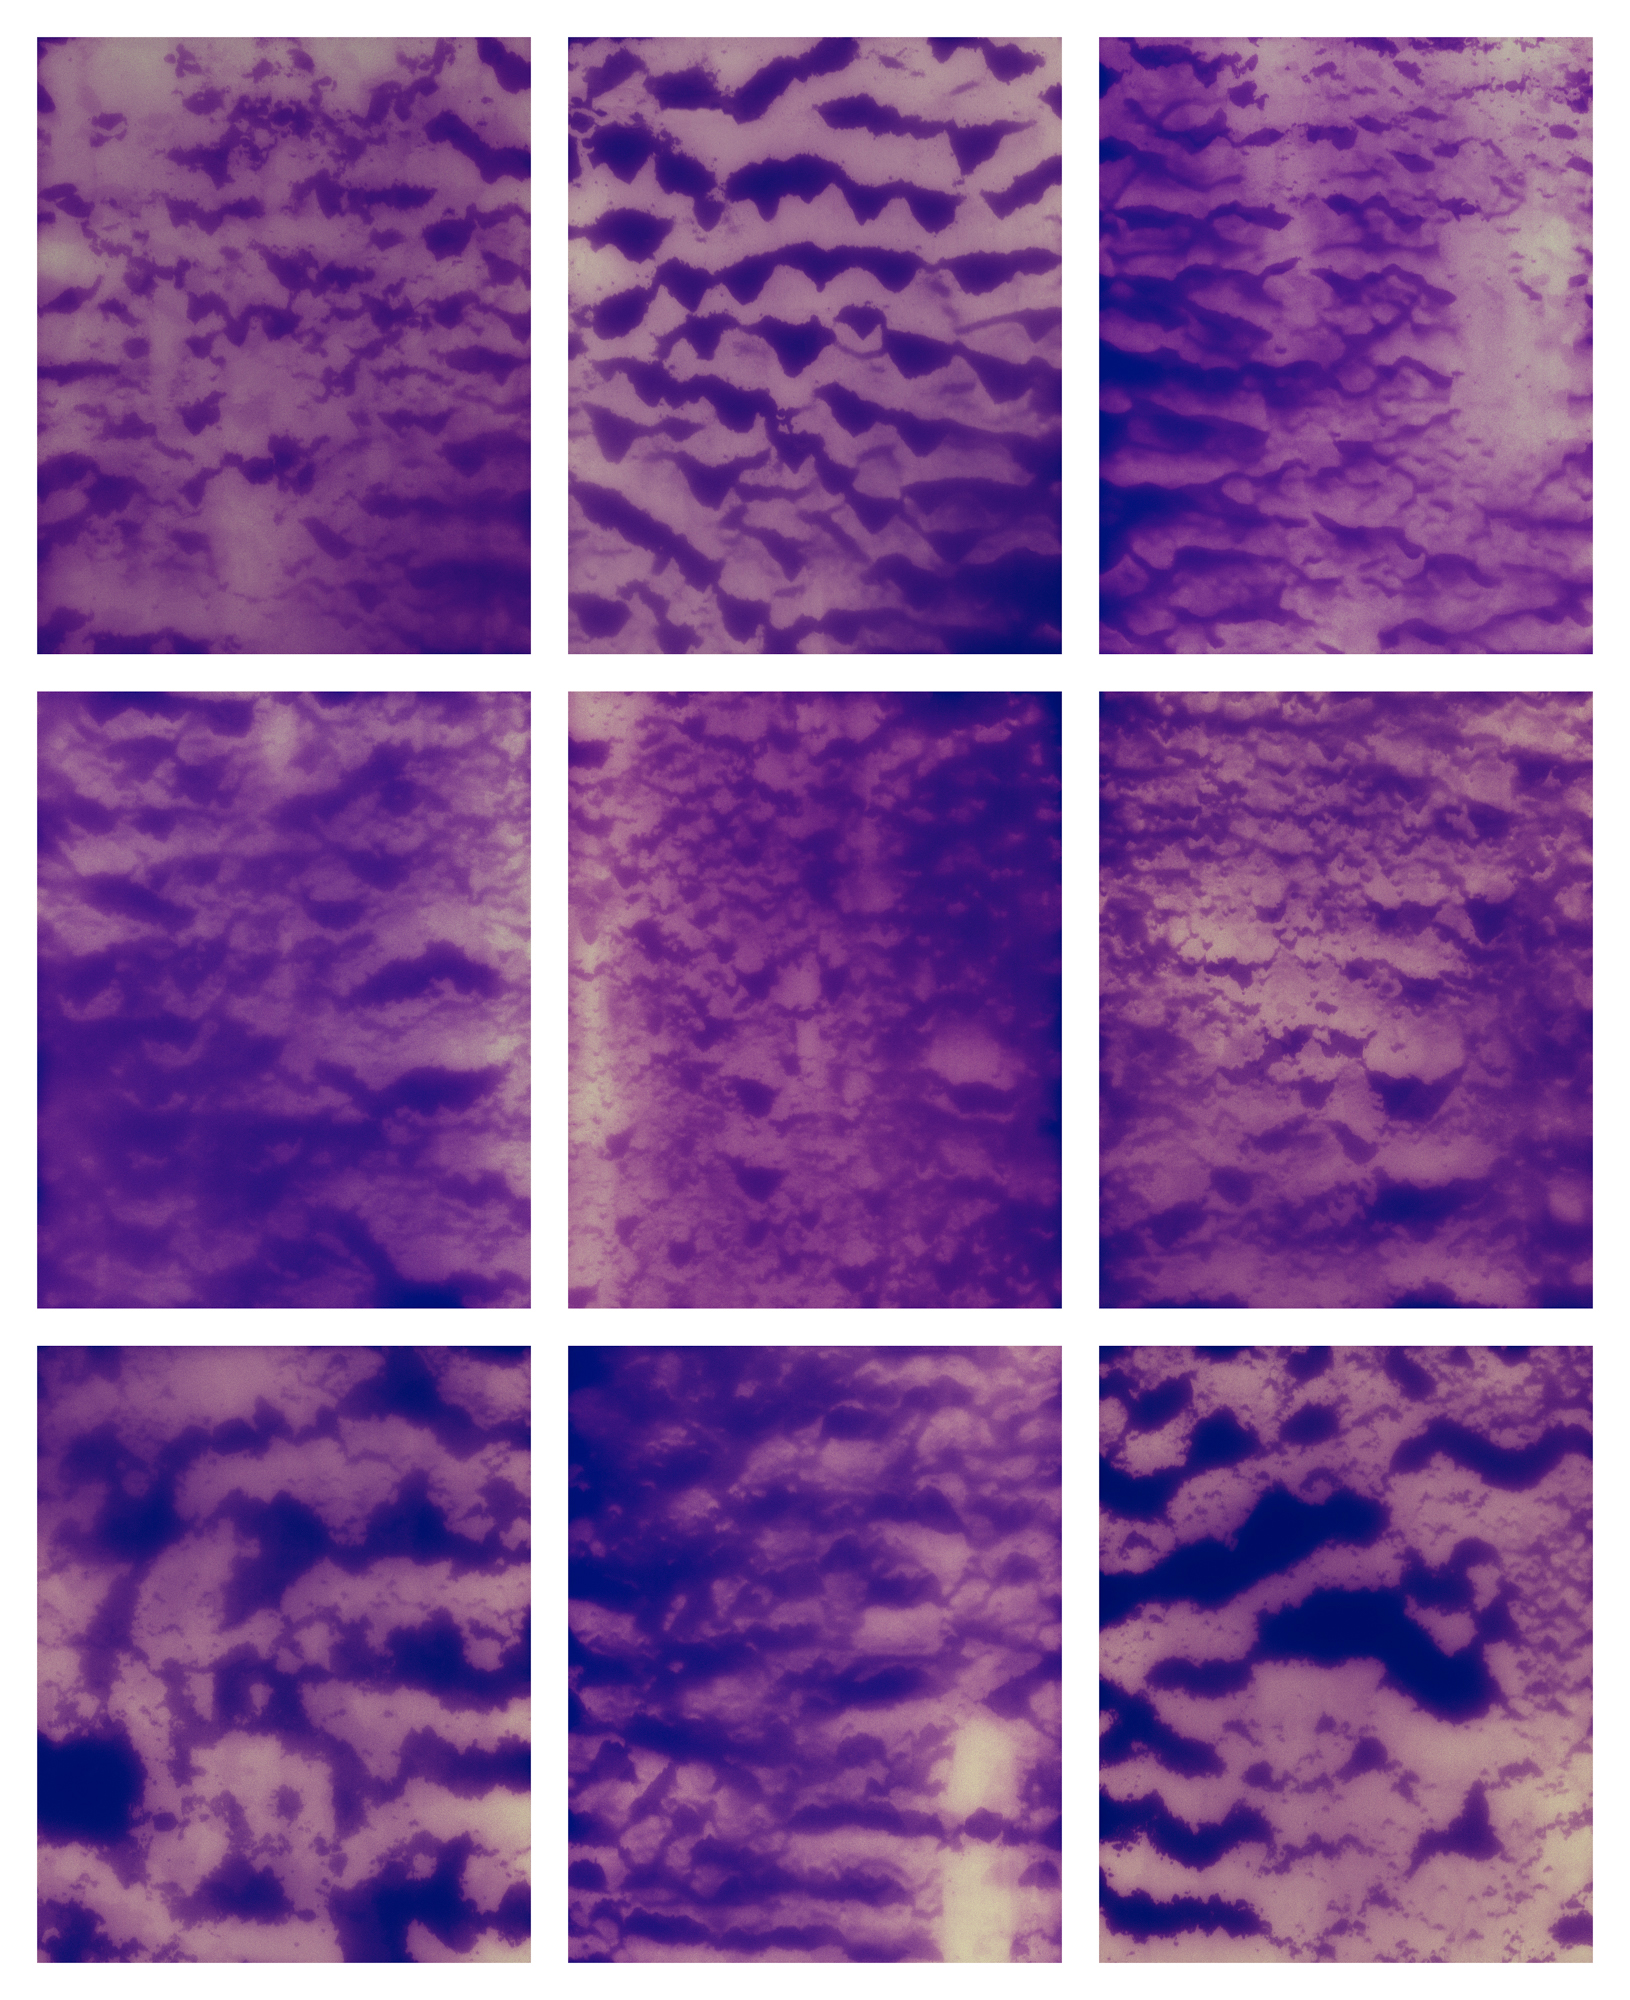 Chiswick II, 2019 (giclée photogram made from nine negatives)